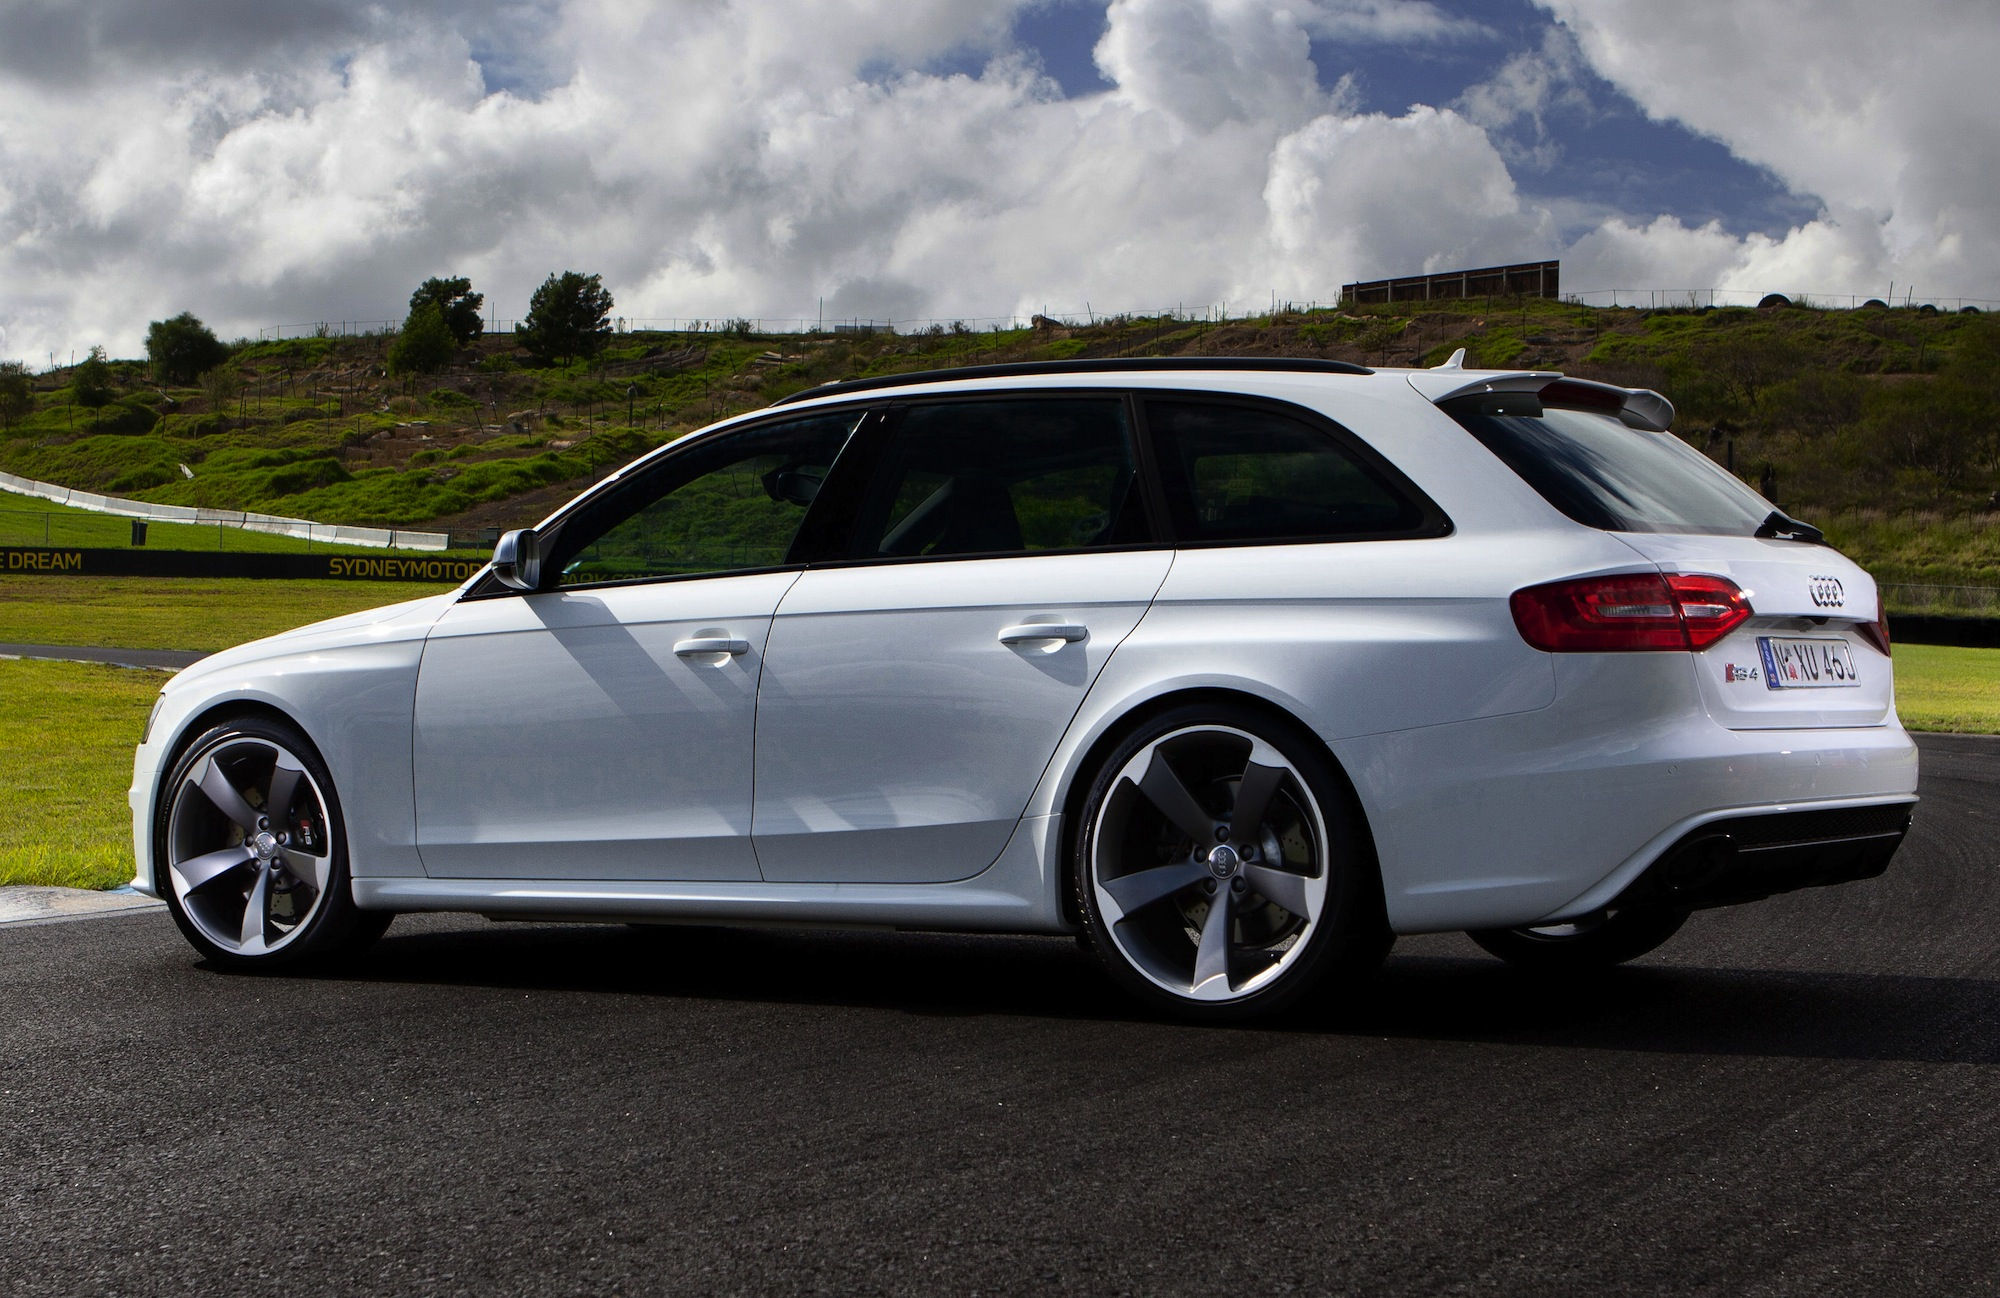 Audi RS4 Avant hot wagon rolls into Australia  Photos 1 of 6